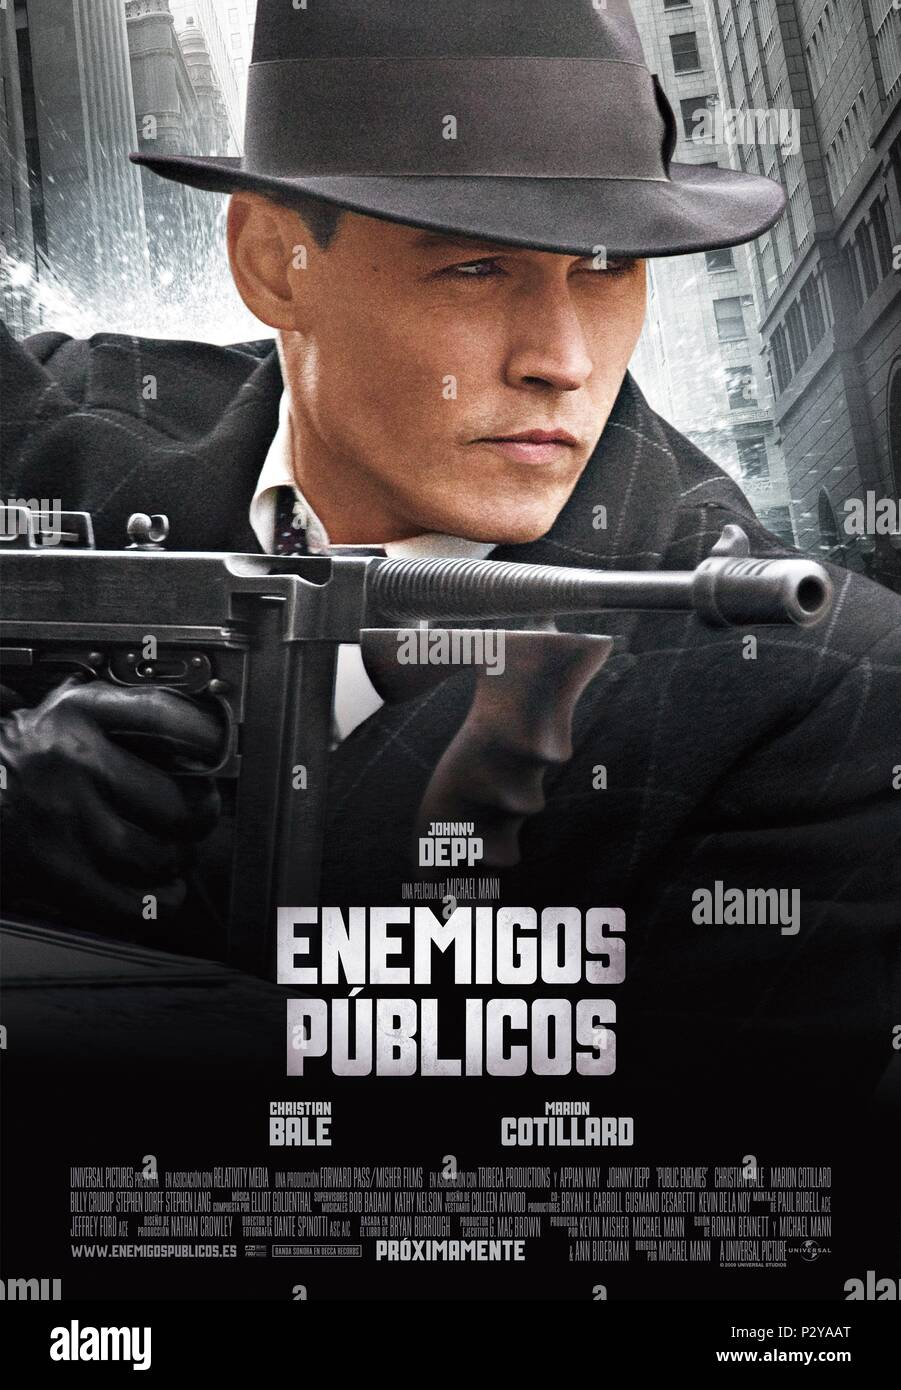 80bb0f154bd Original Film Title: PUBLIC ENEMIES. English Title: PUBLIC ENEMIES. Film  Director: